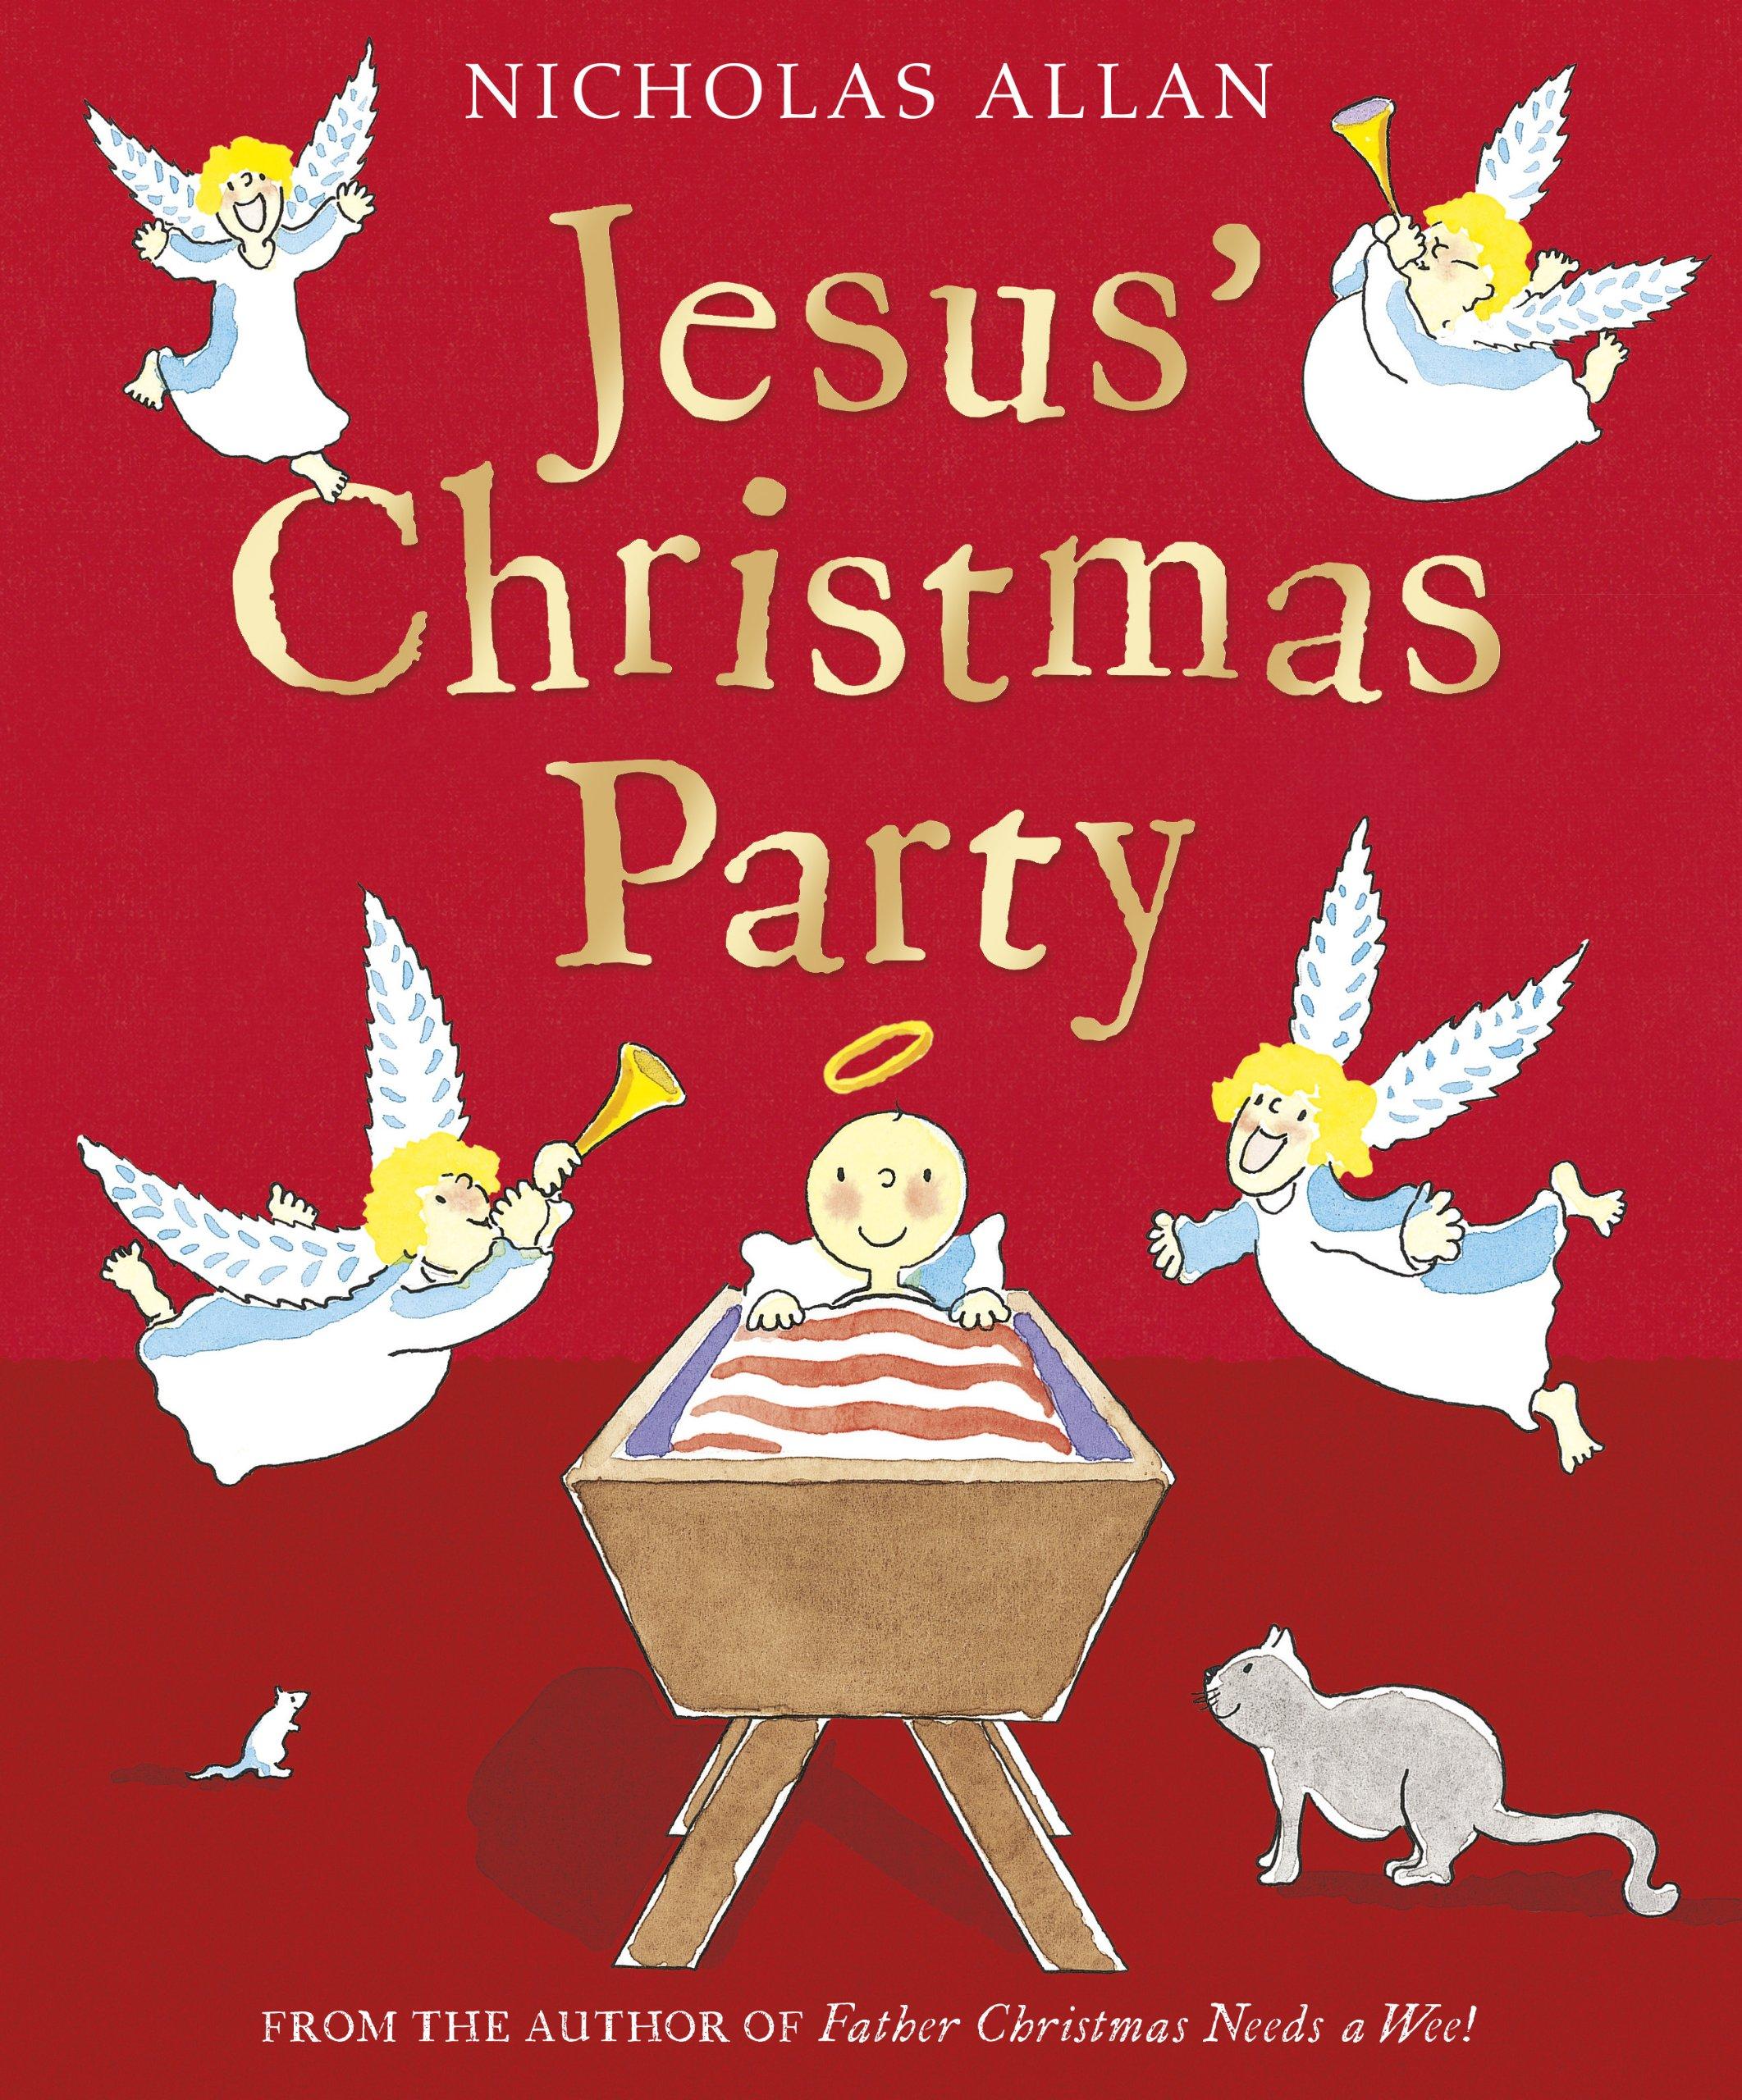 Jesus\' Christmas Party: Nicholas Allan: 9781849415262: Amazon.com: Books